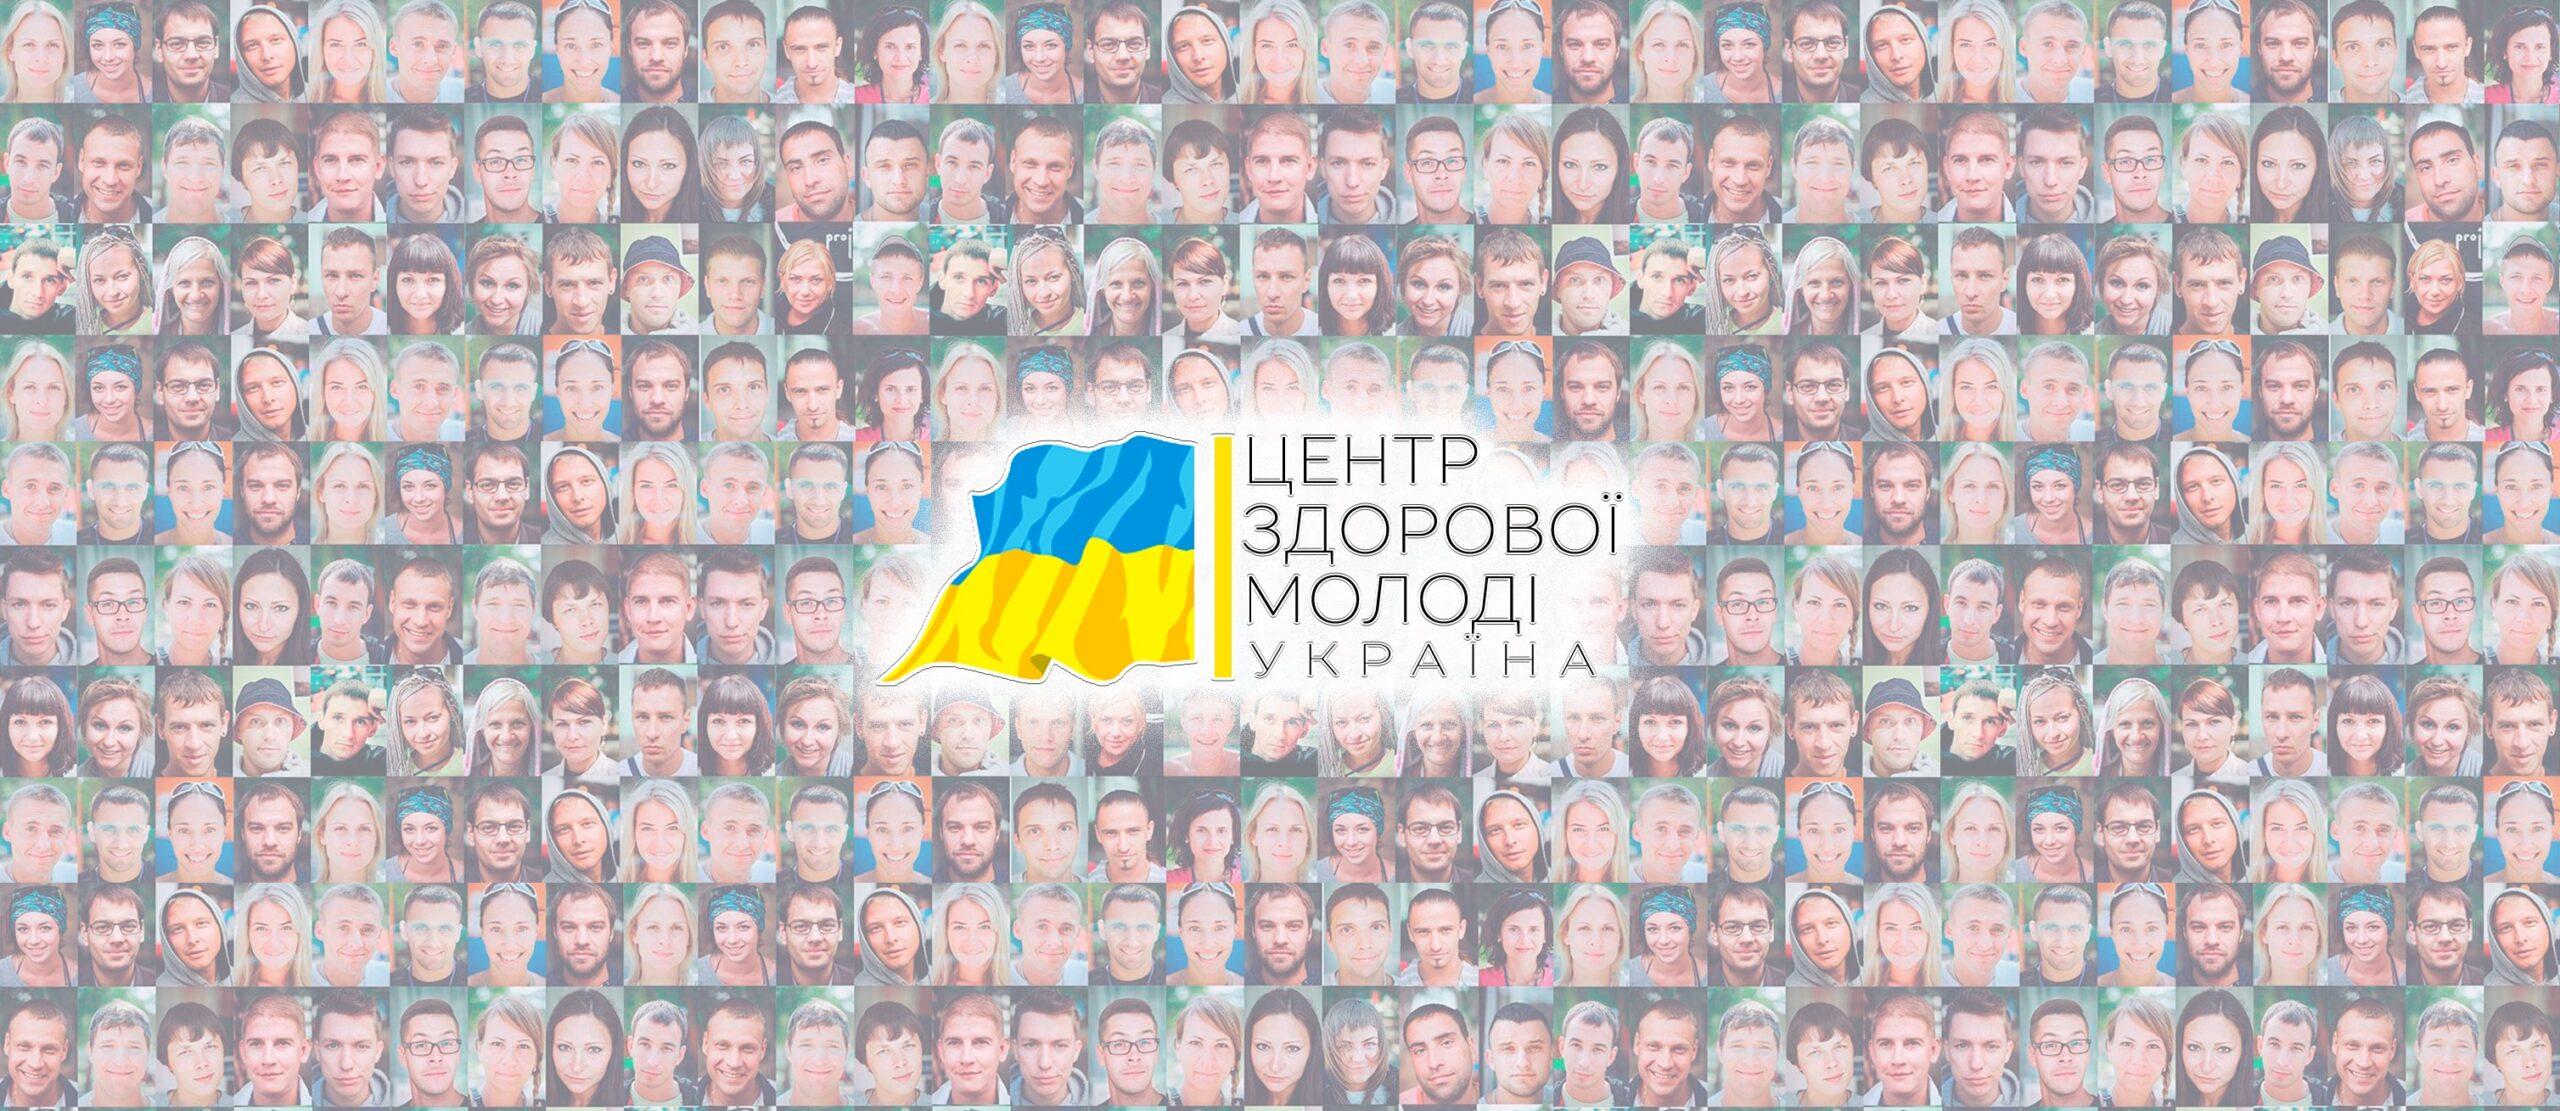 цзм Украина